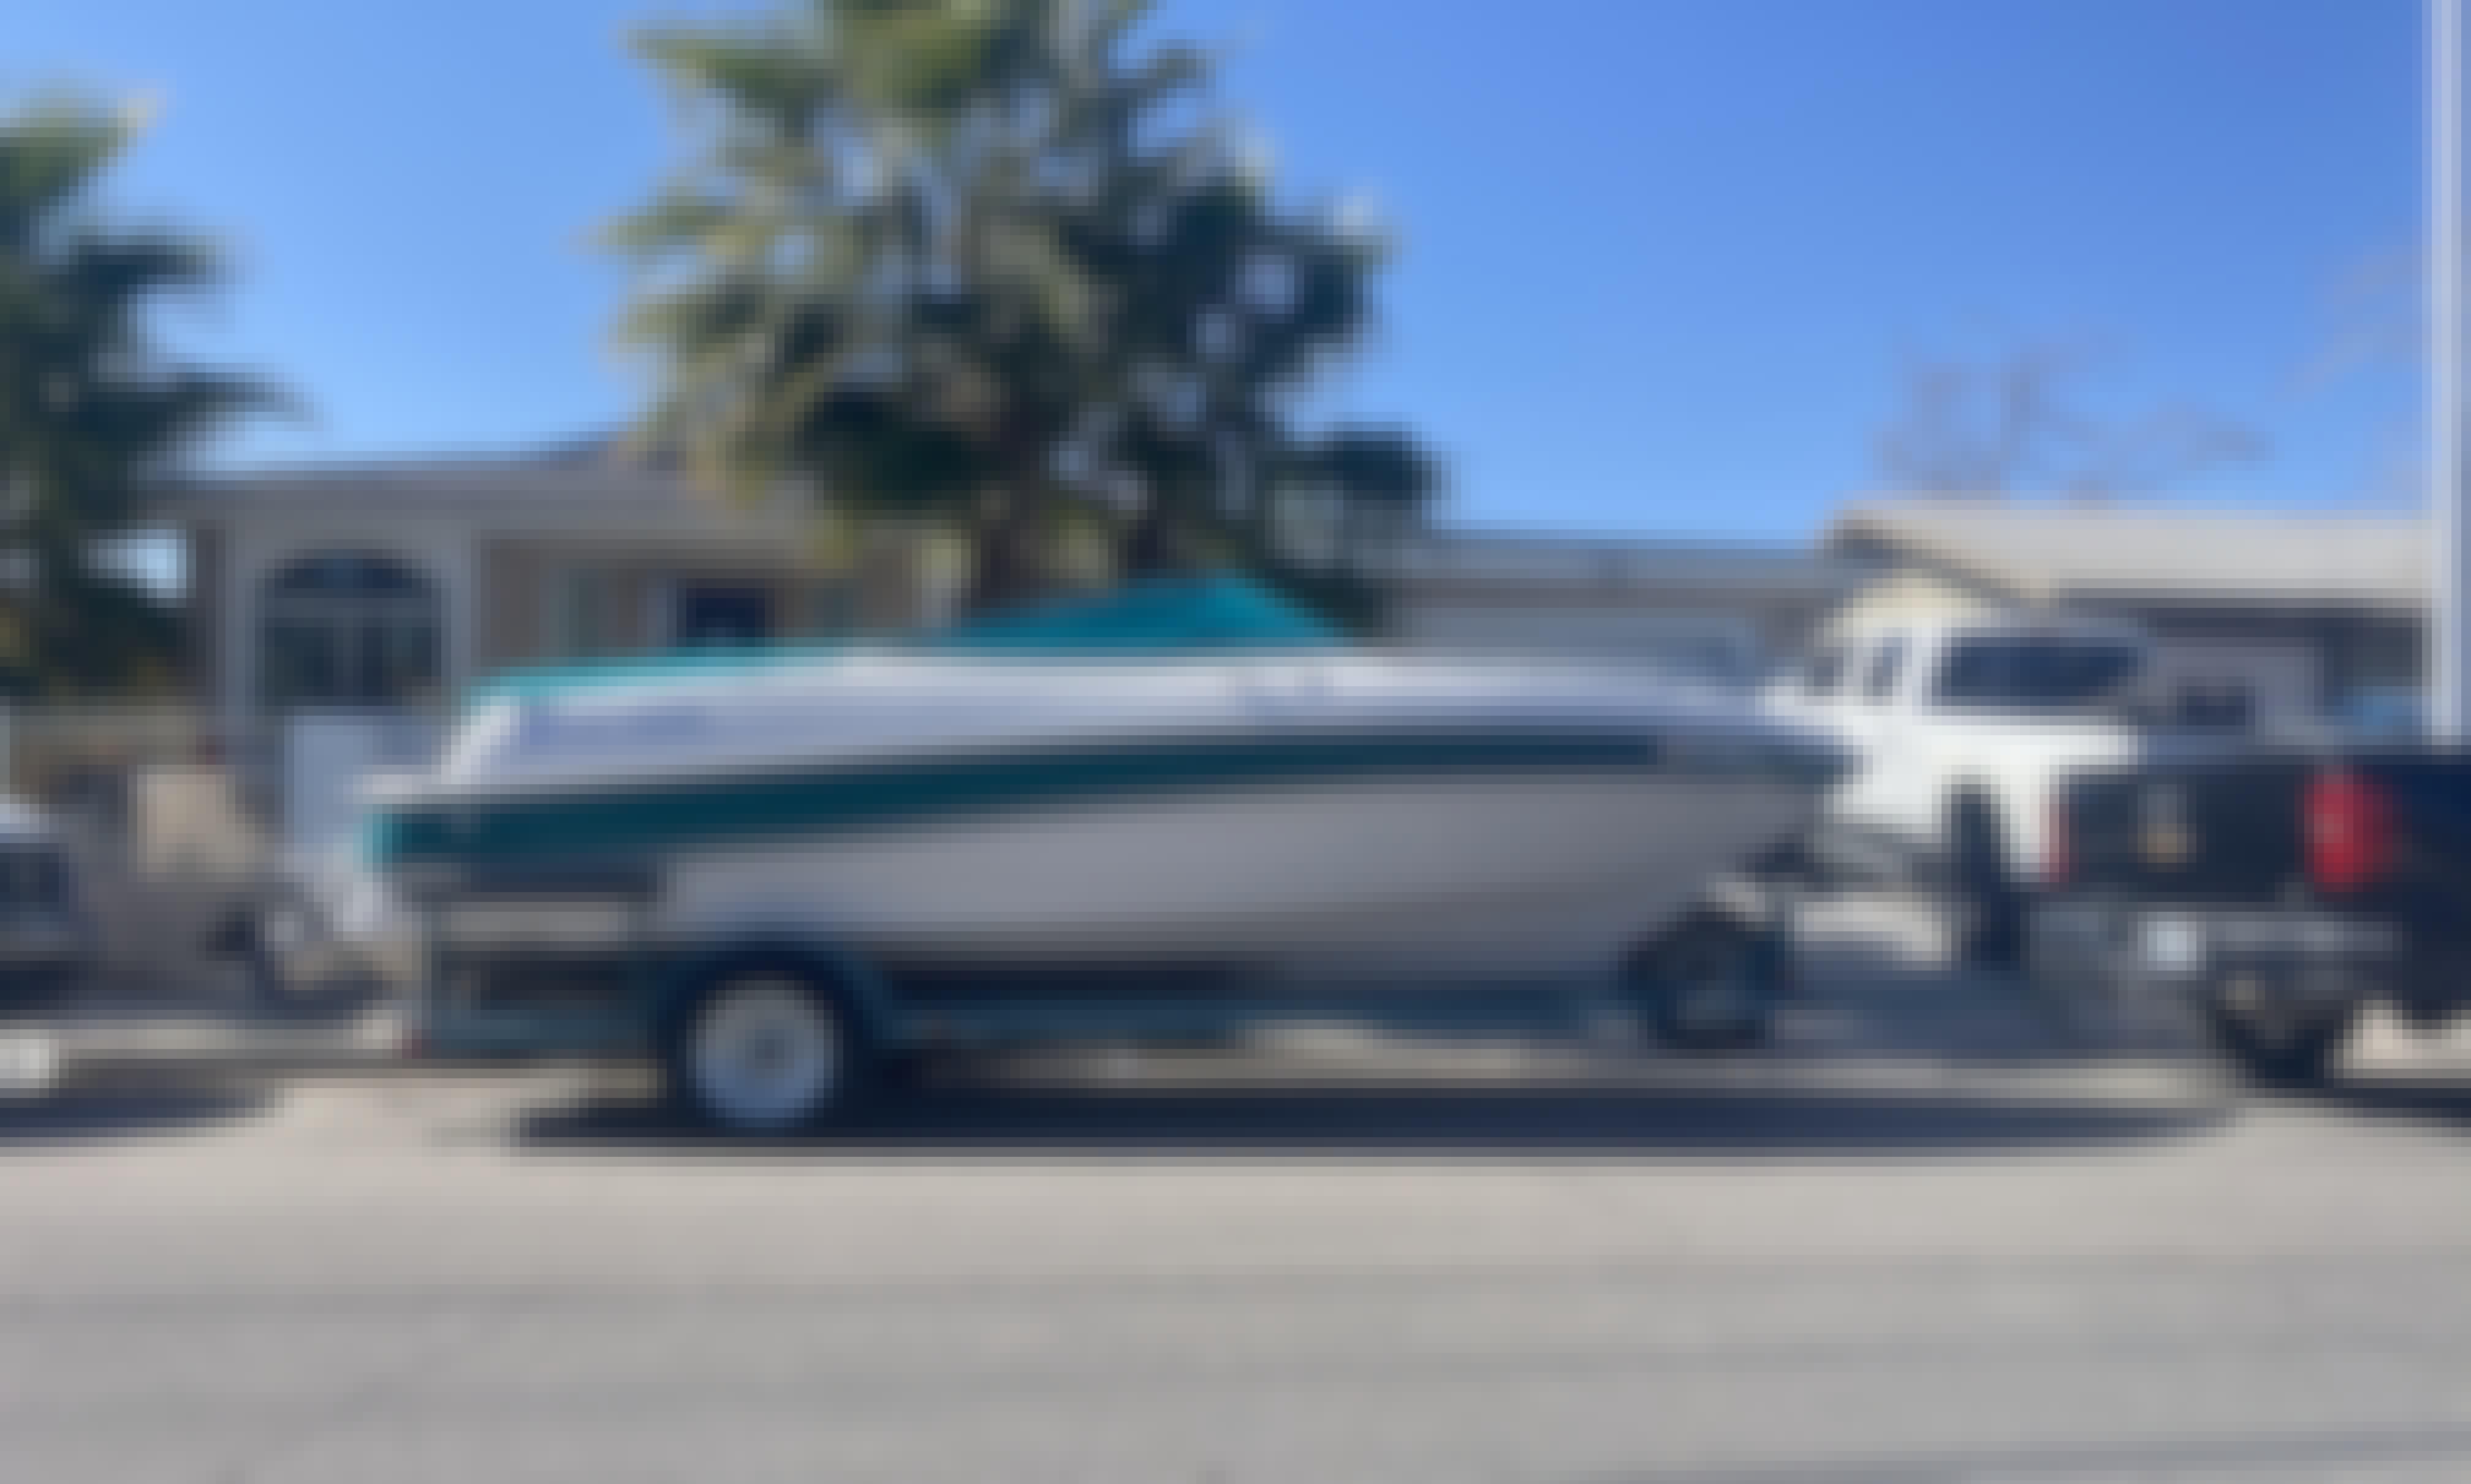 Four Winns Powerboat for Rent in North Las Vegas